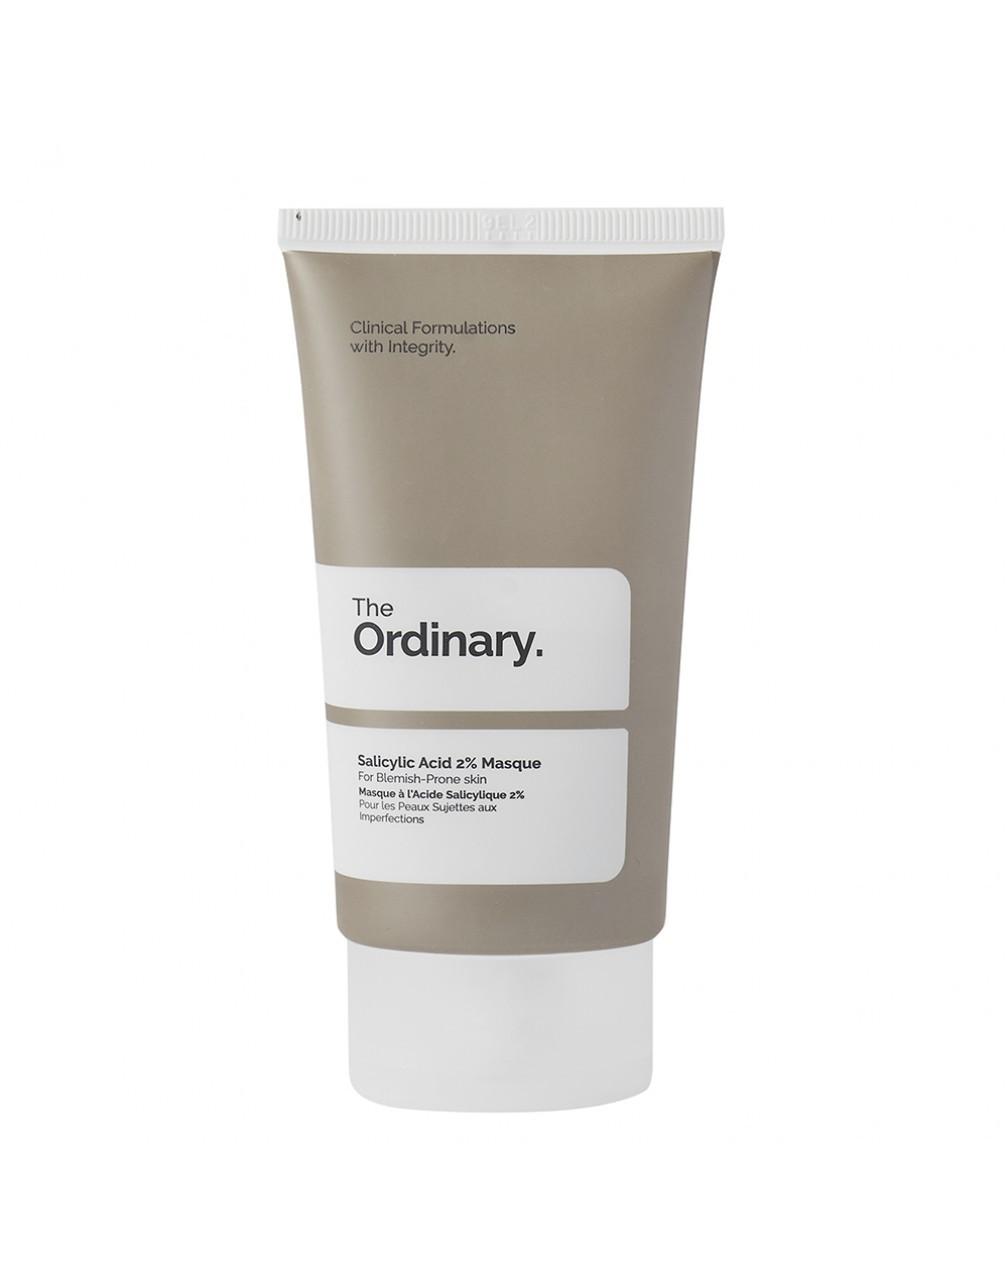 Маска для лица The Ordinary Salicylic Acid 2% Masque 50ml